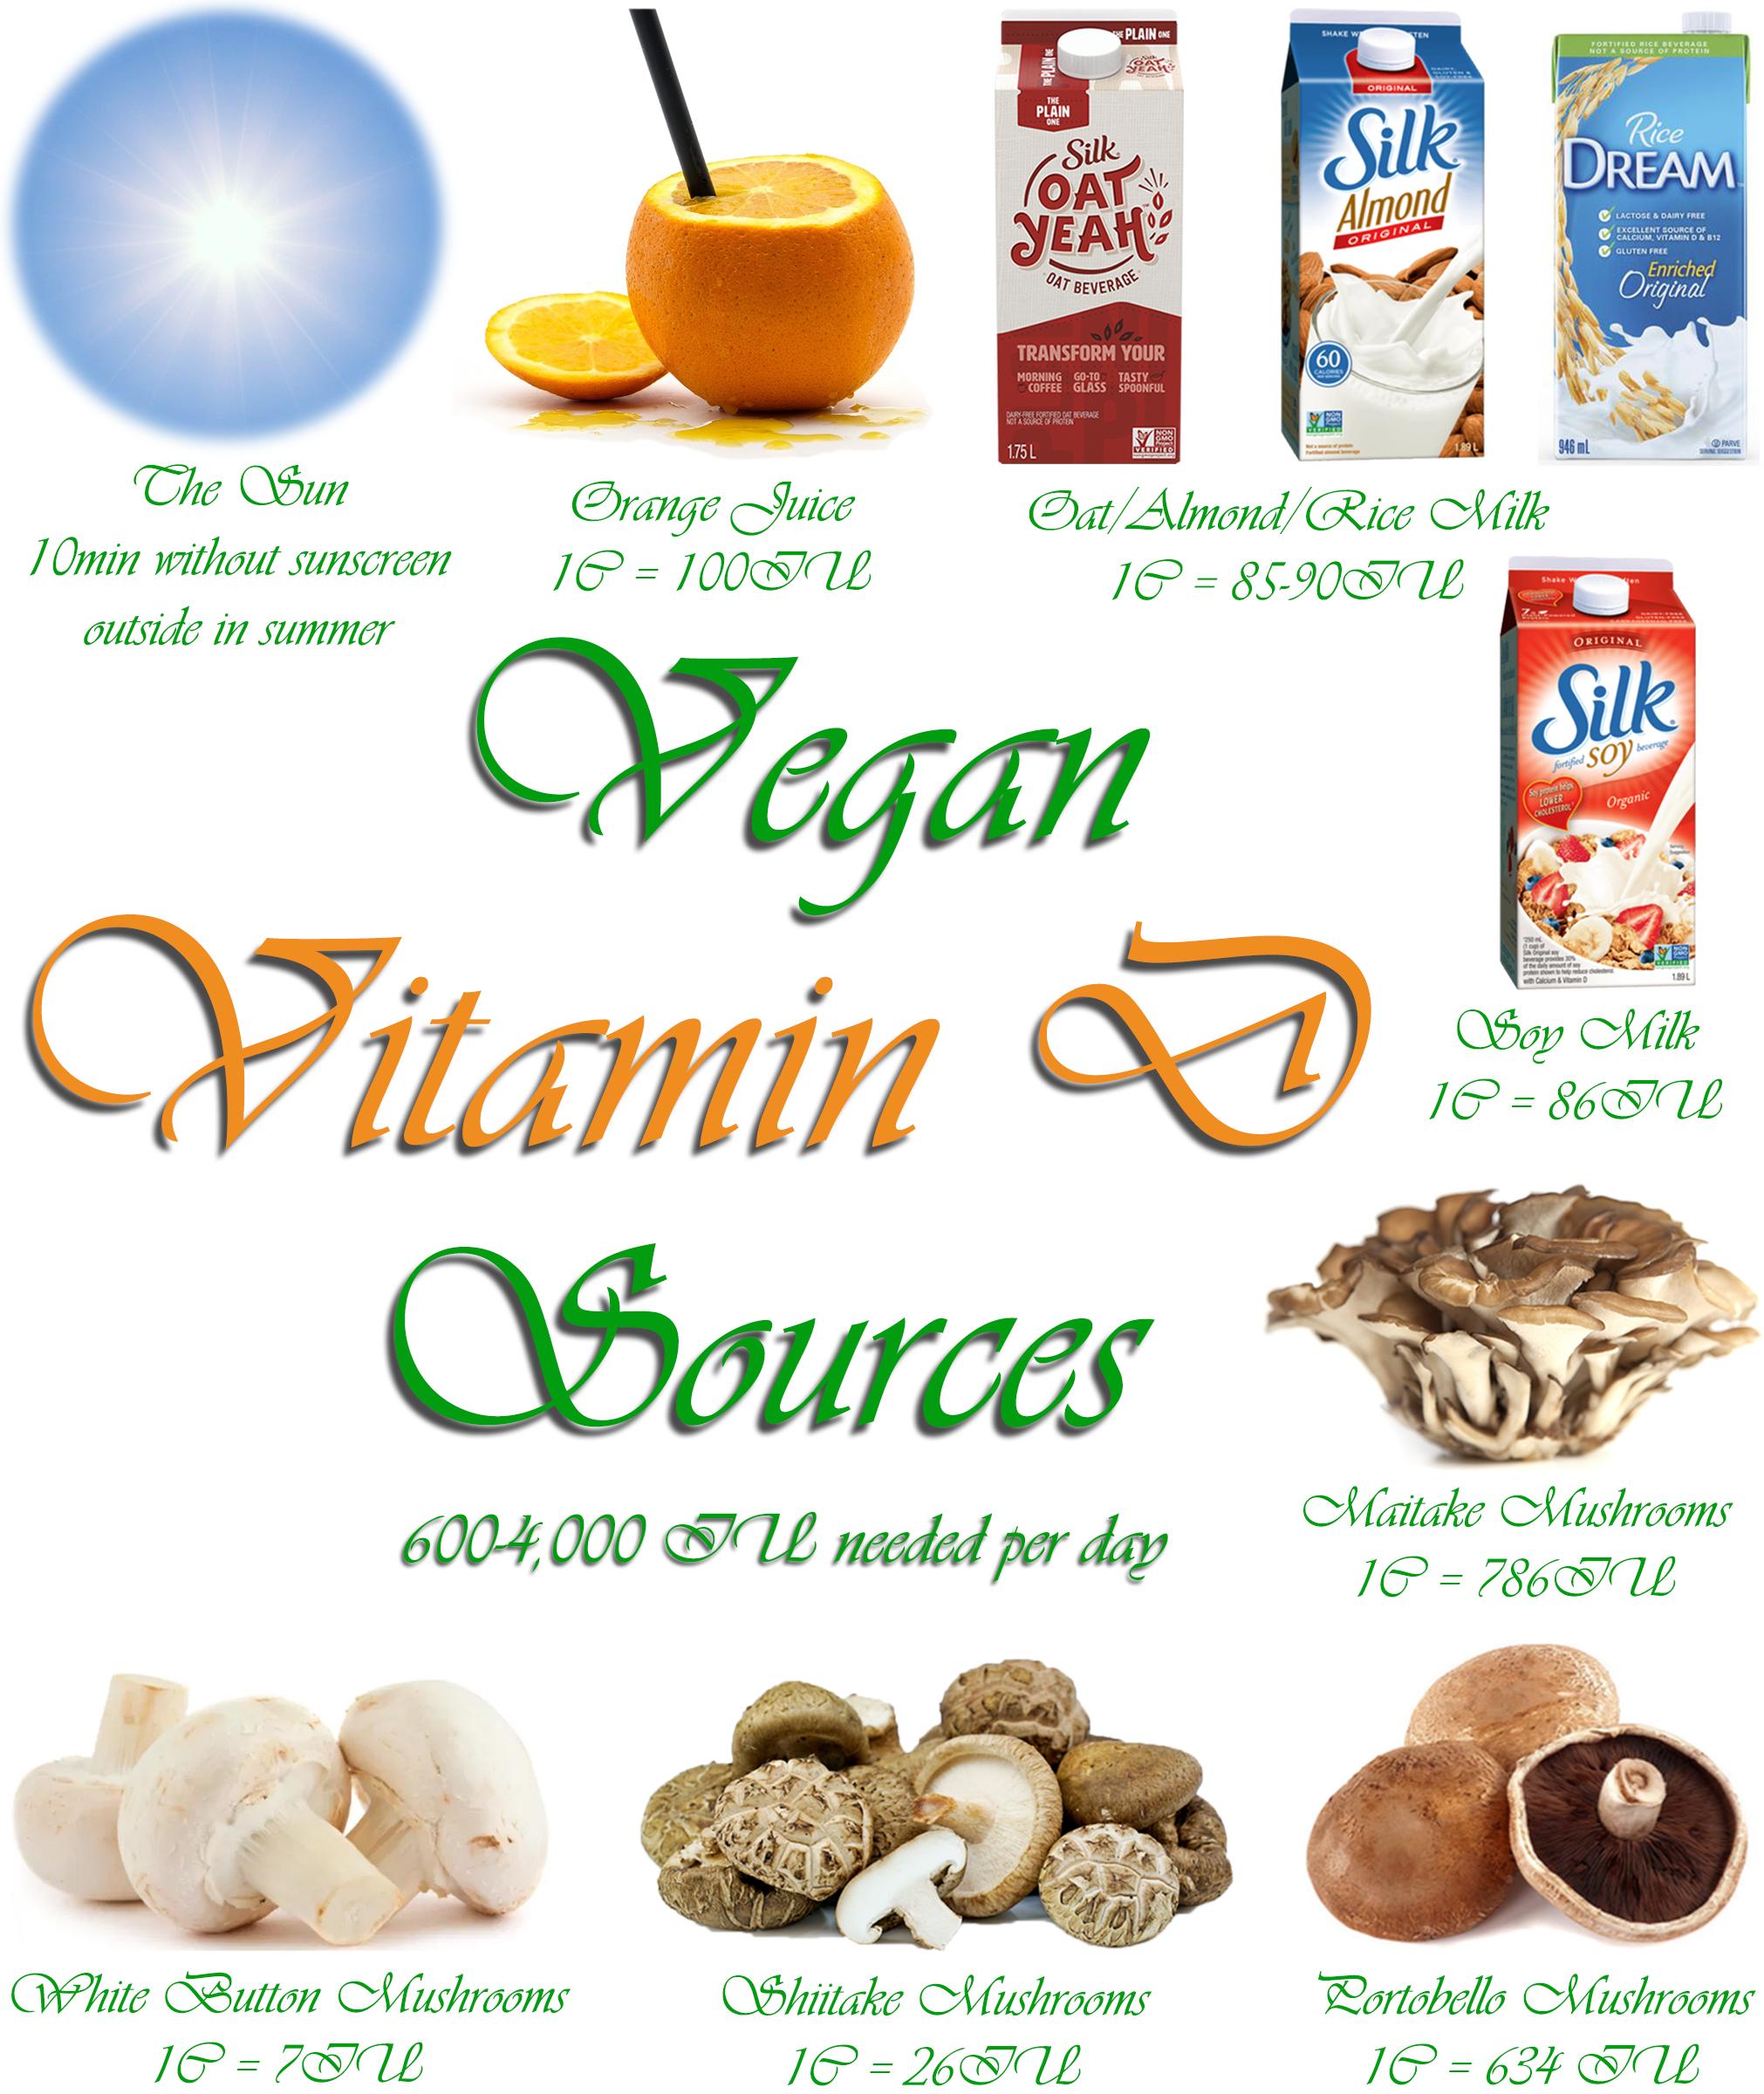 AterImber.com - The Veg Life - Vegan Tips - Vegan Nutrients Series - Where Do Vegans Get Their Vitamin D? - Vitamin D Collage - vegan tips, vegan food, vegan nutrients, vegan food blogger, food blogger